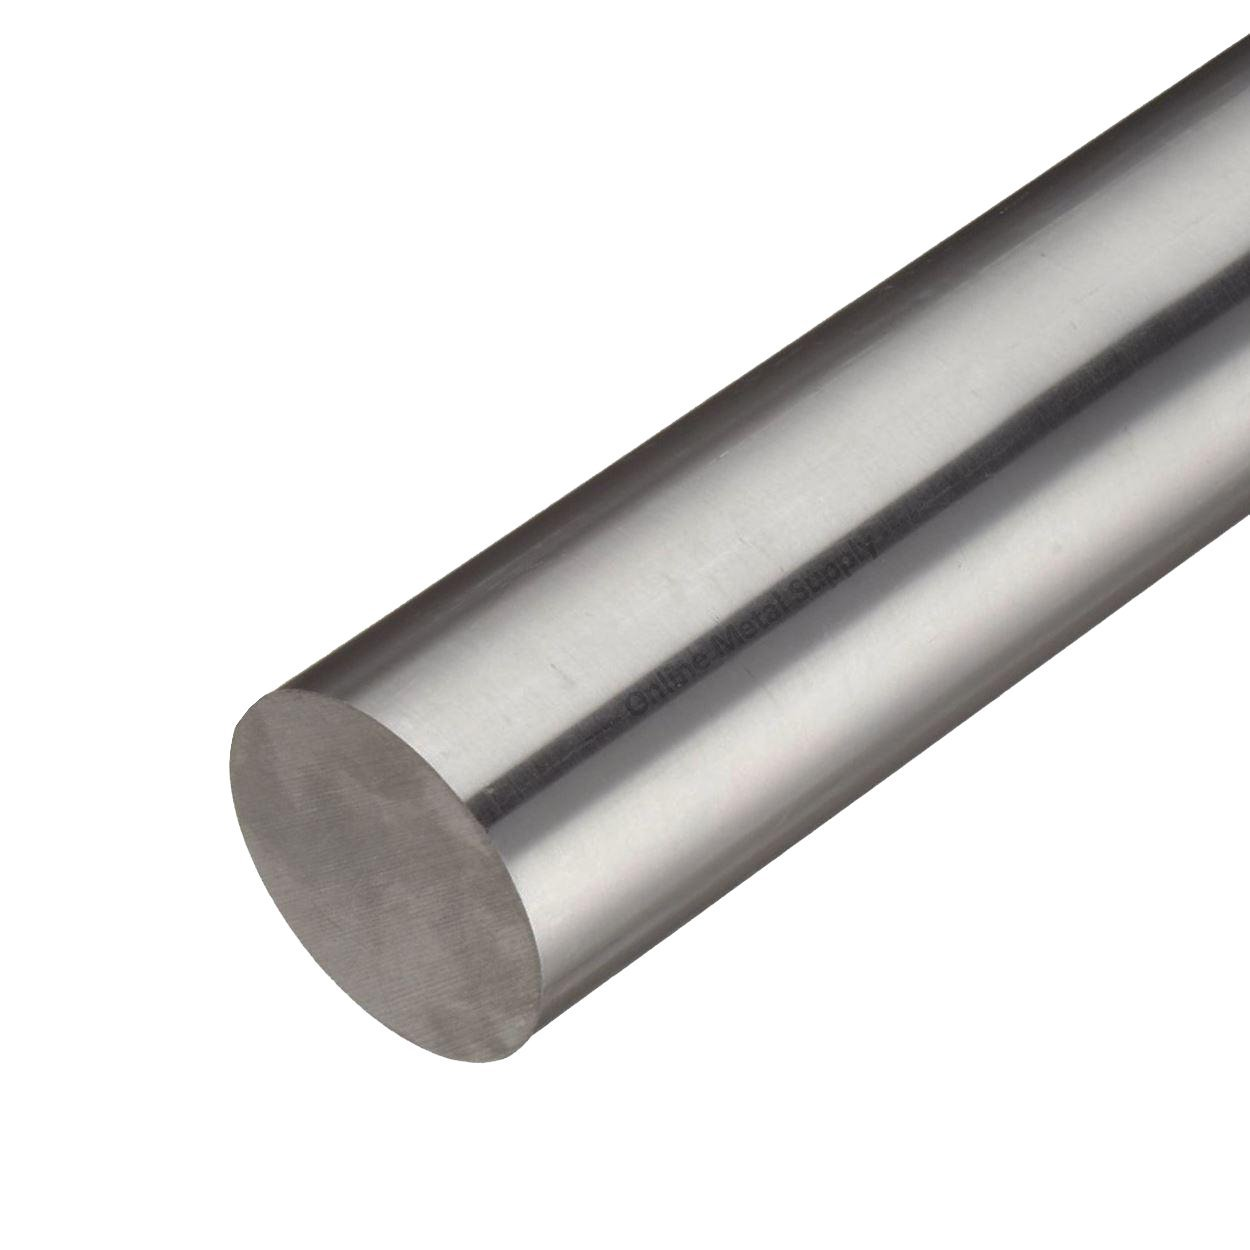 Amazon.com: 2 varillas de acero inoxidable 316L, diámetro ...